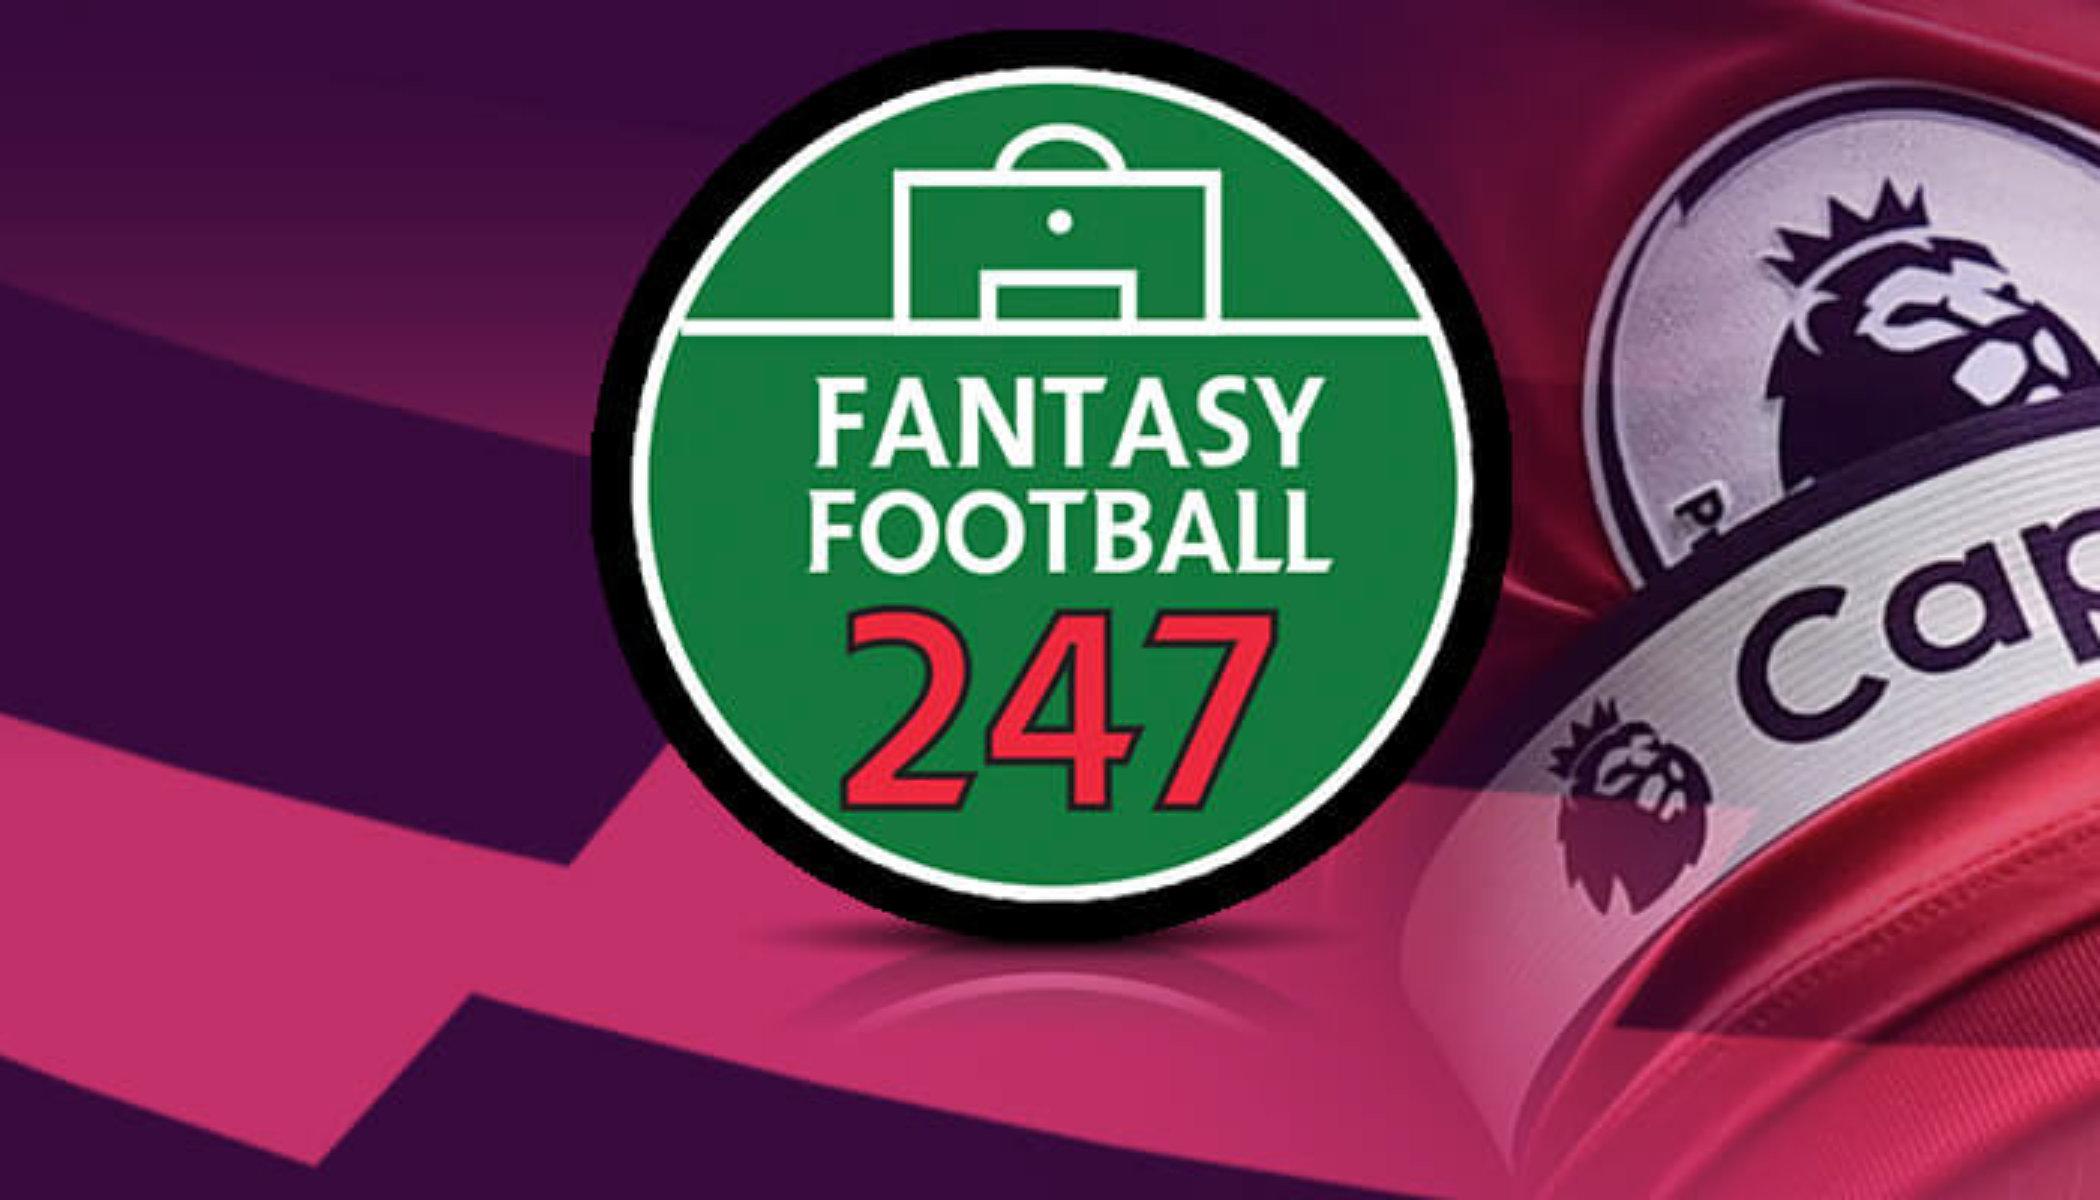 Fantasy Football Captain Picks Archives - Fantasy Football